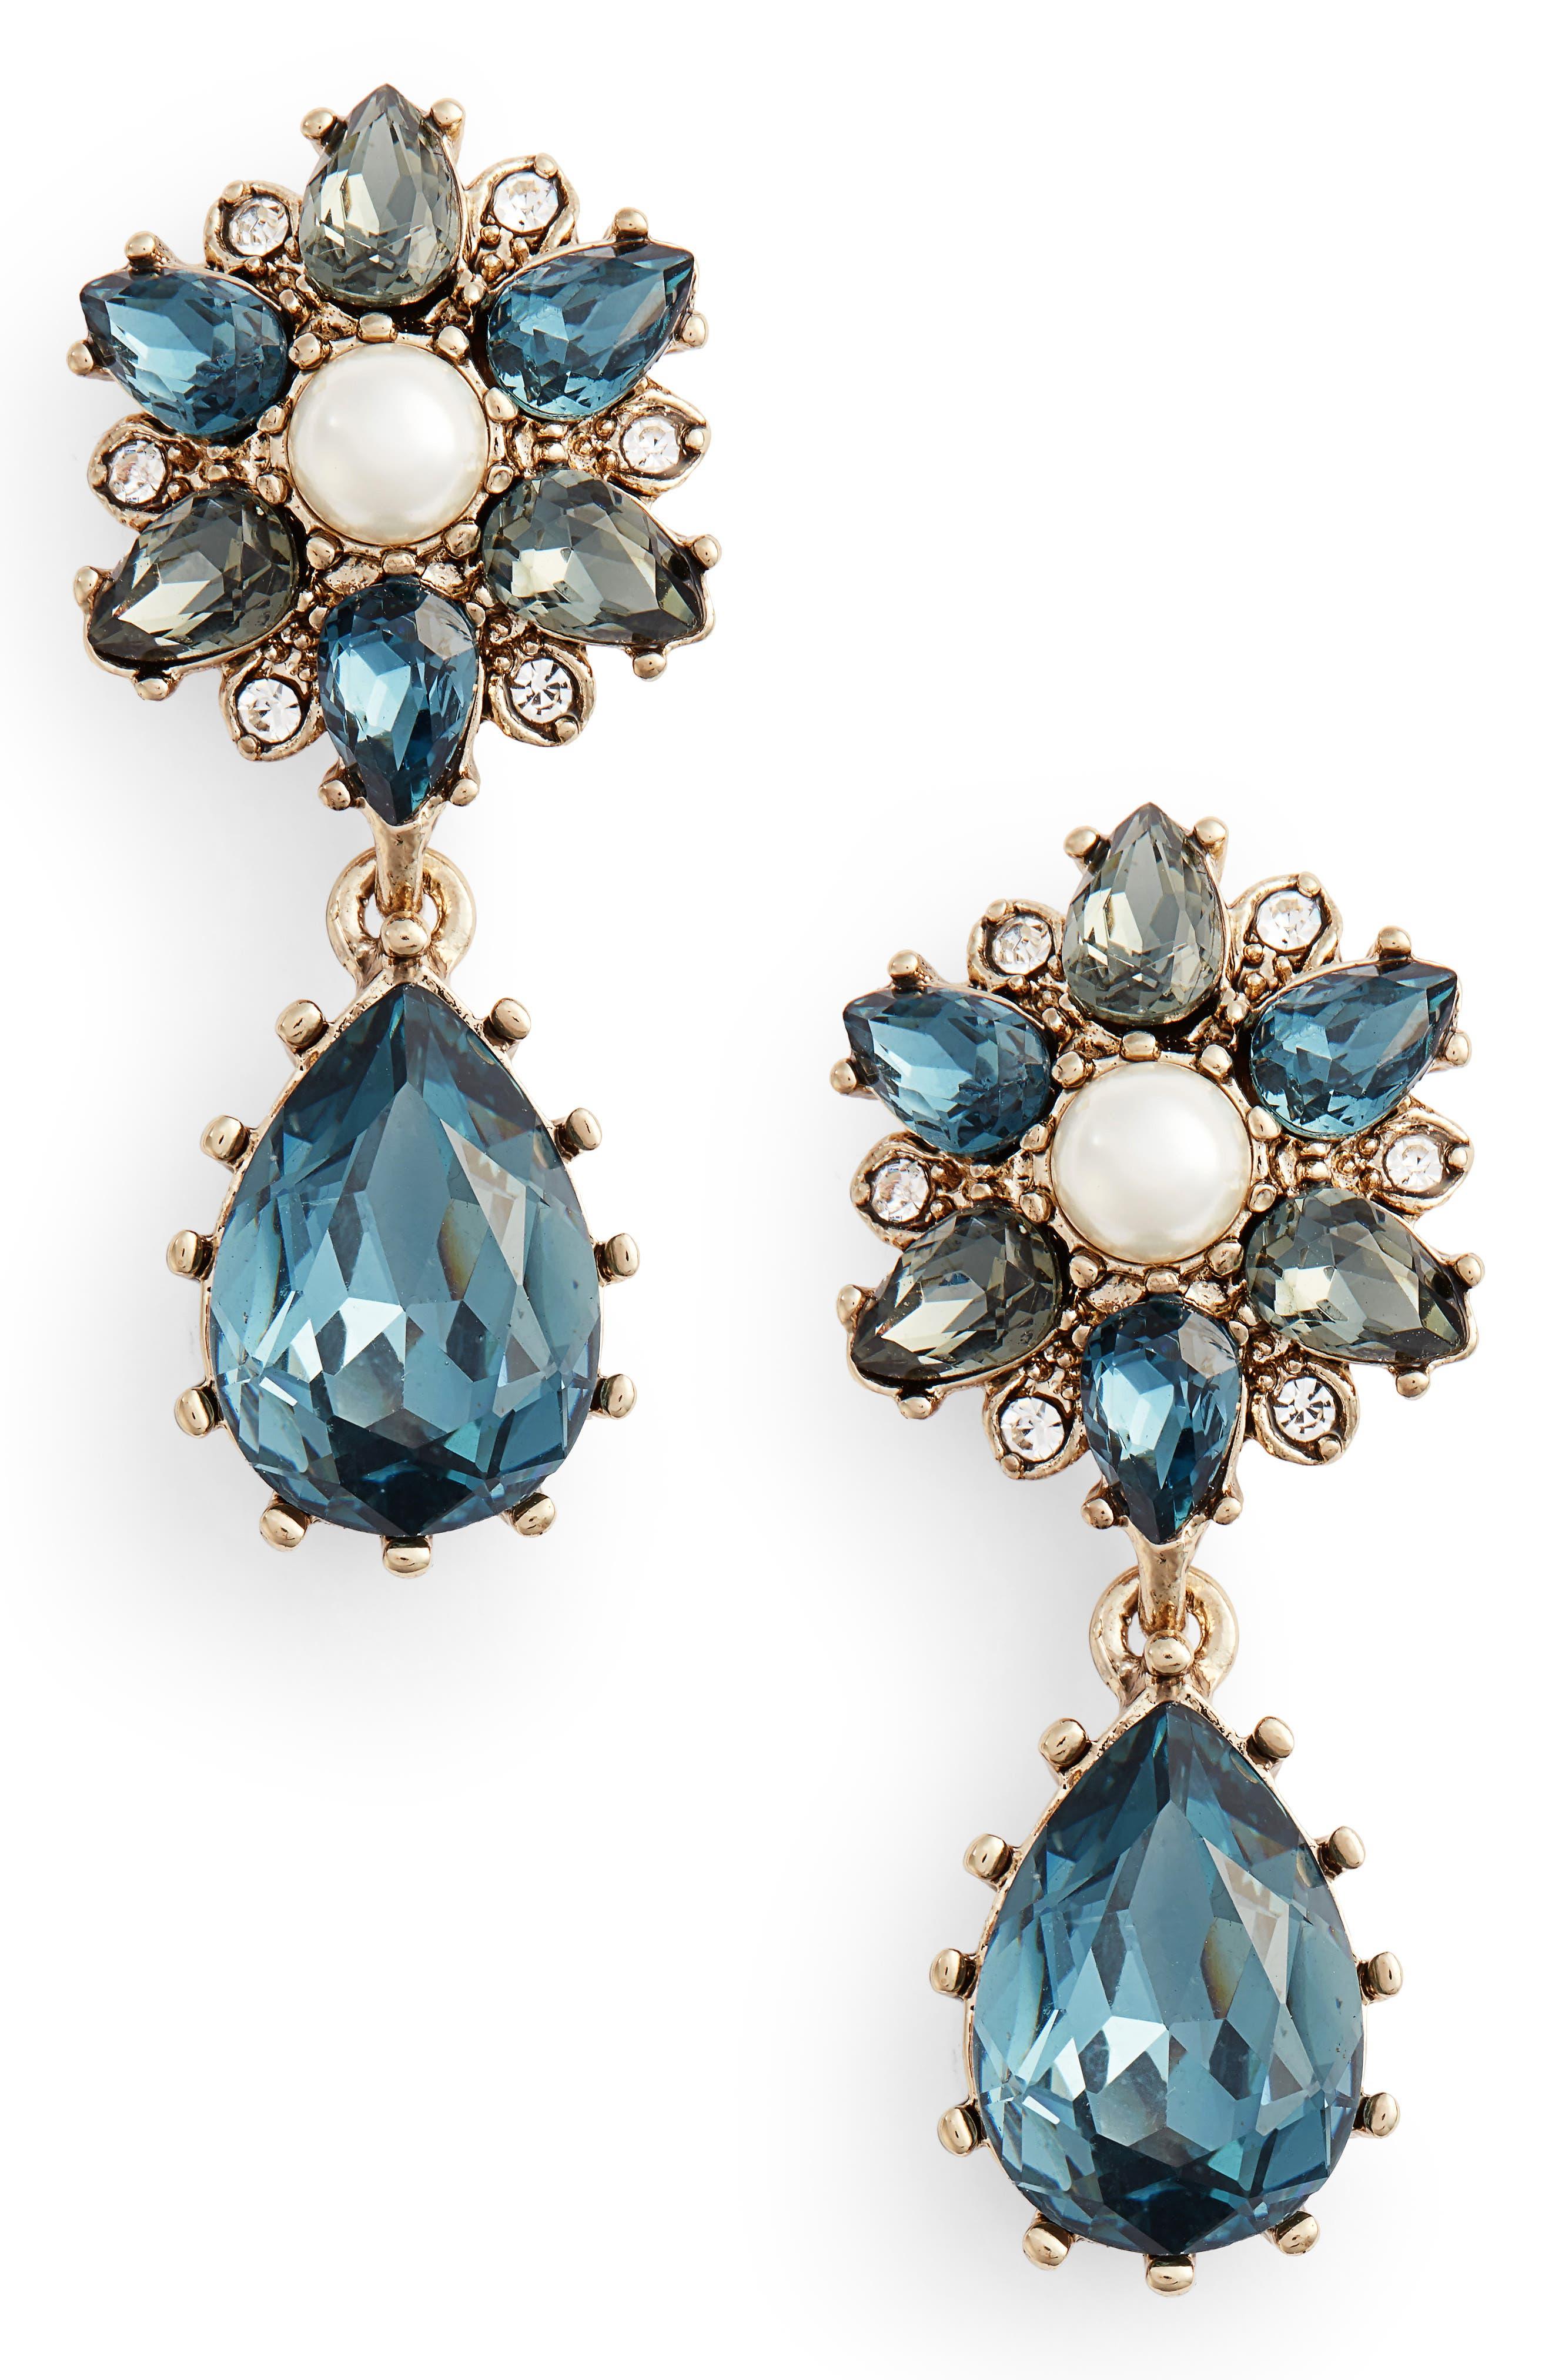 Double Drop Earrings,                             Main thumbnail 1, color,                             BLUE MULTI/ GOLD